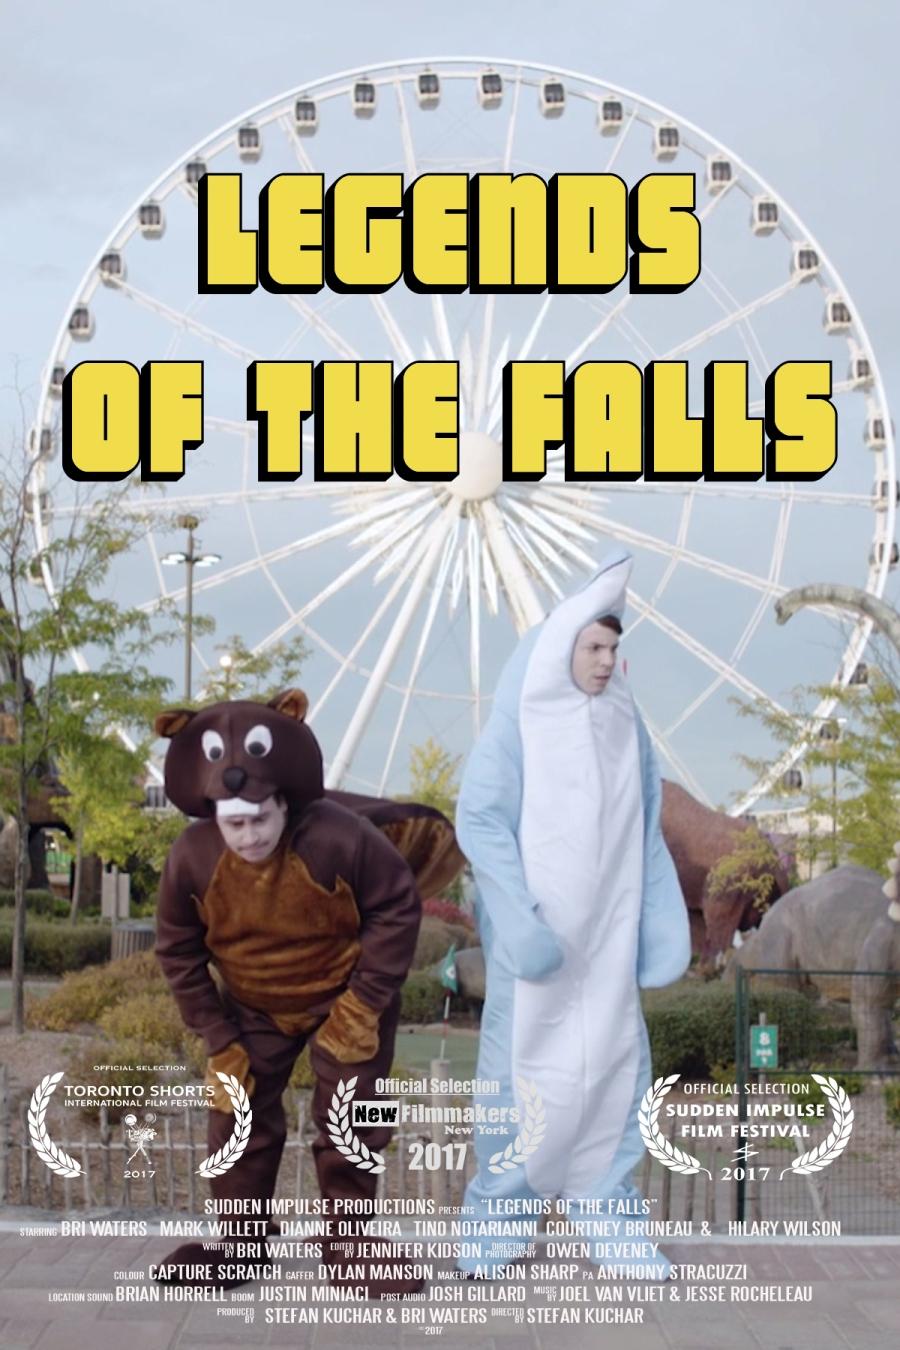 LegendsOfTheFalls_Poster